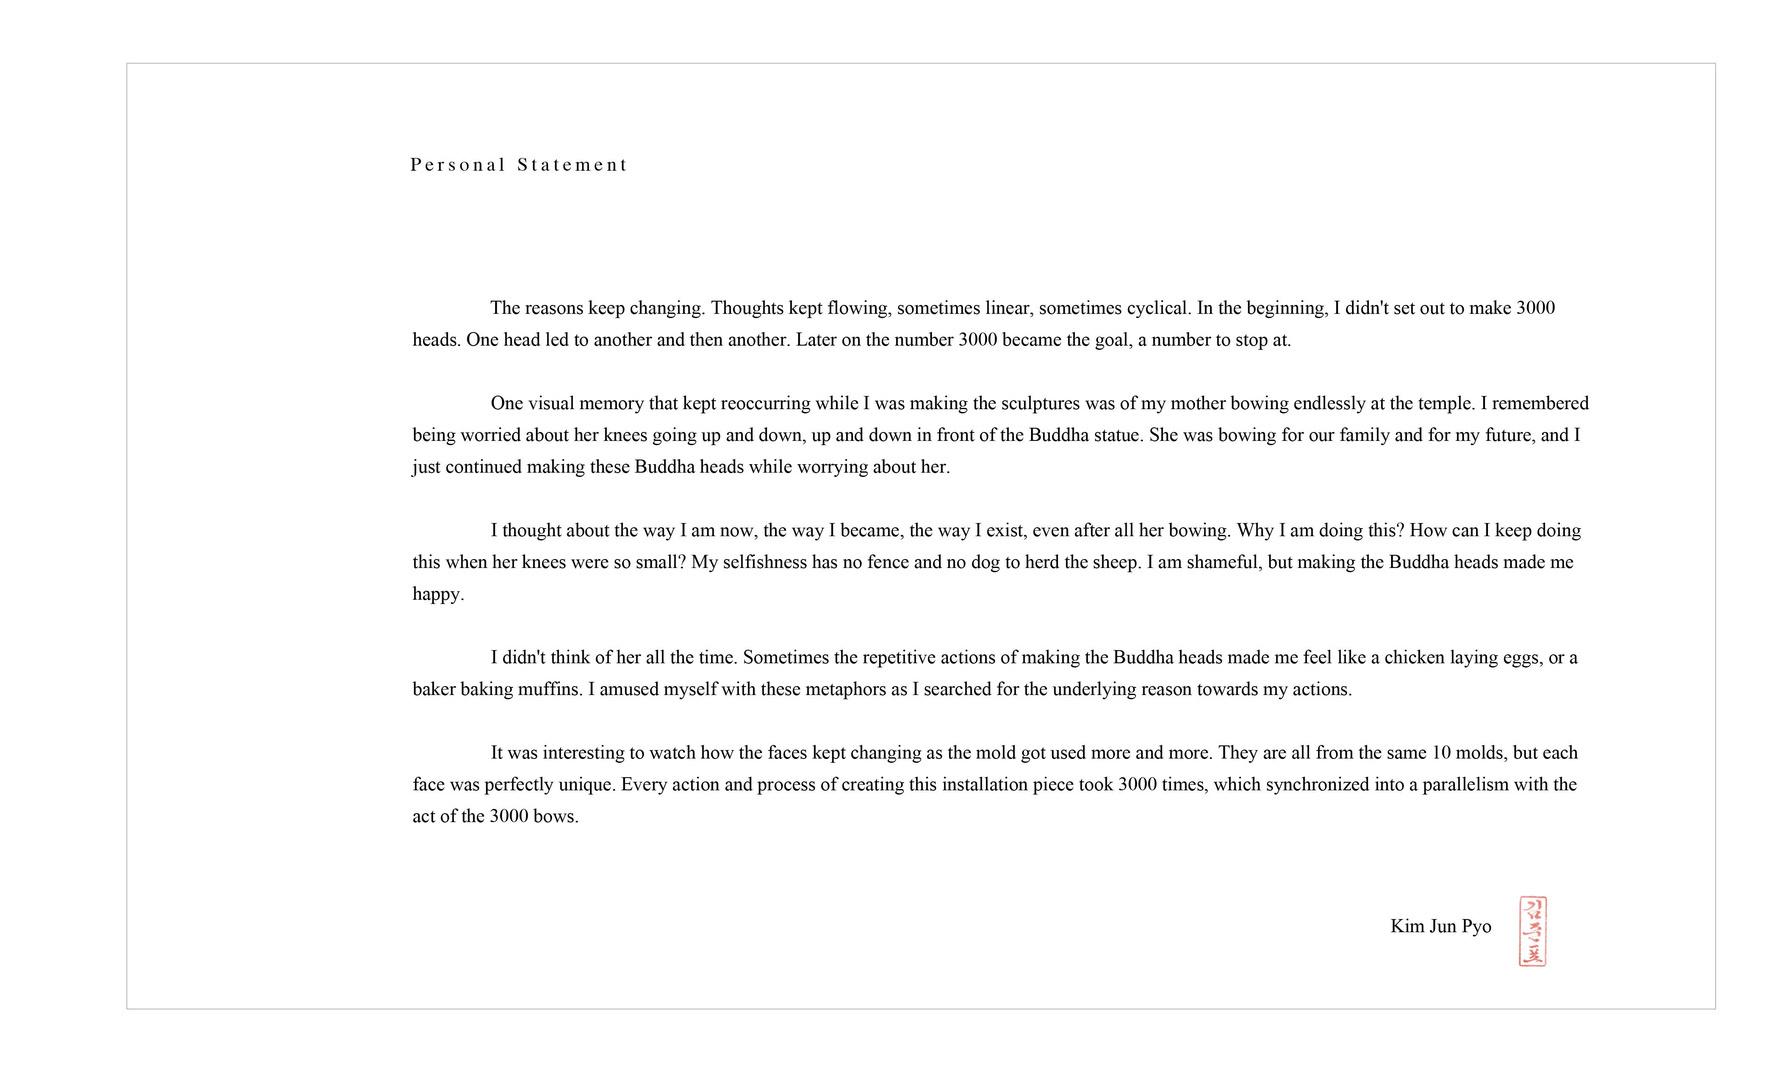 02 -1 personal statement.jpg